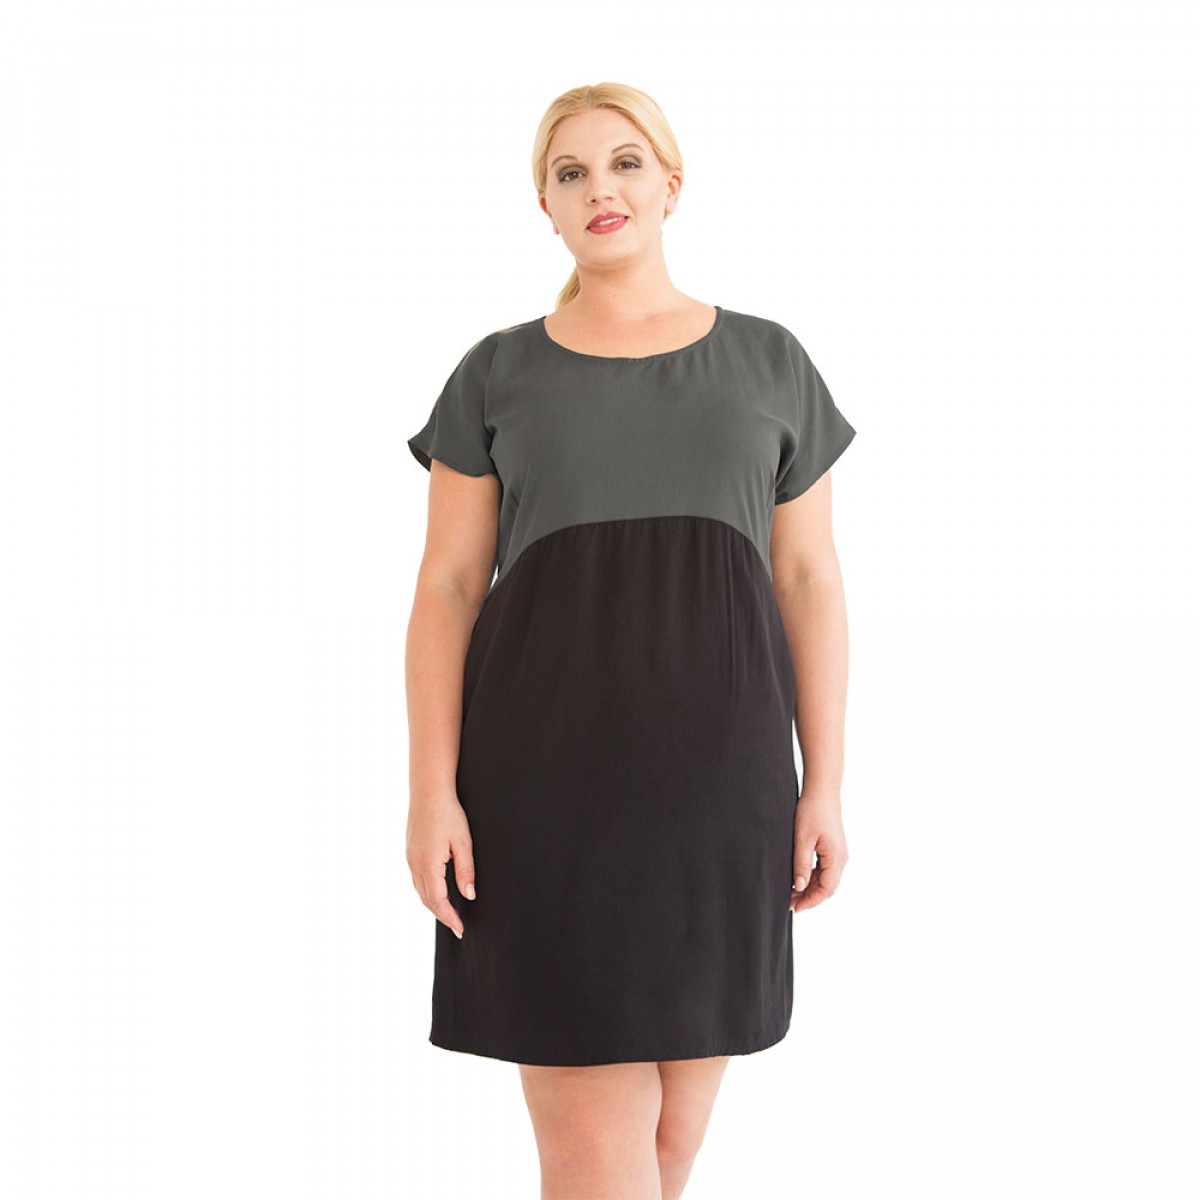 "WiDDA - Kleid ""Too Grey"" aus Tencel"